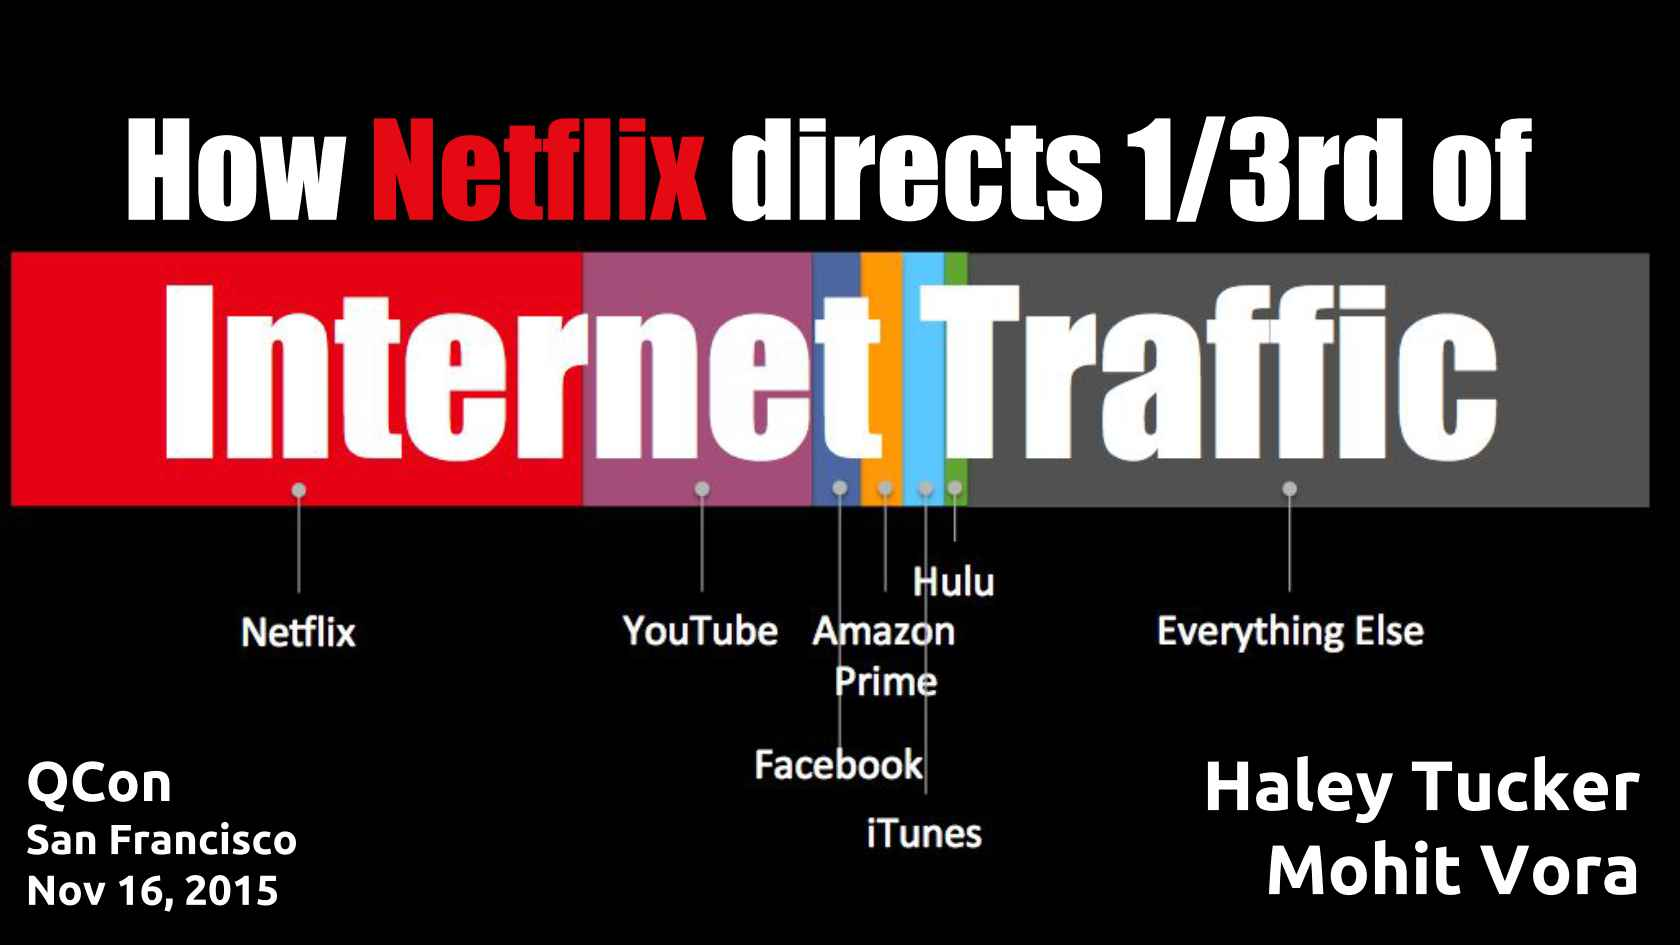 how netflix directs 13rd of internet traffic